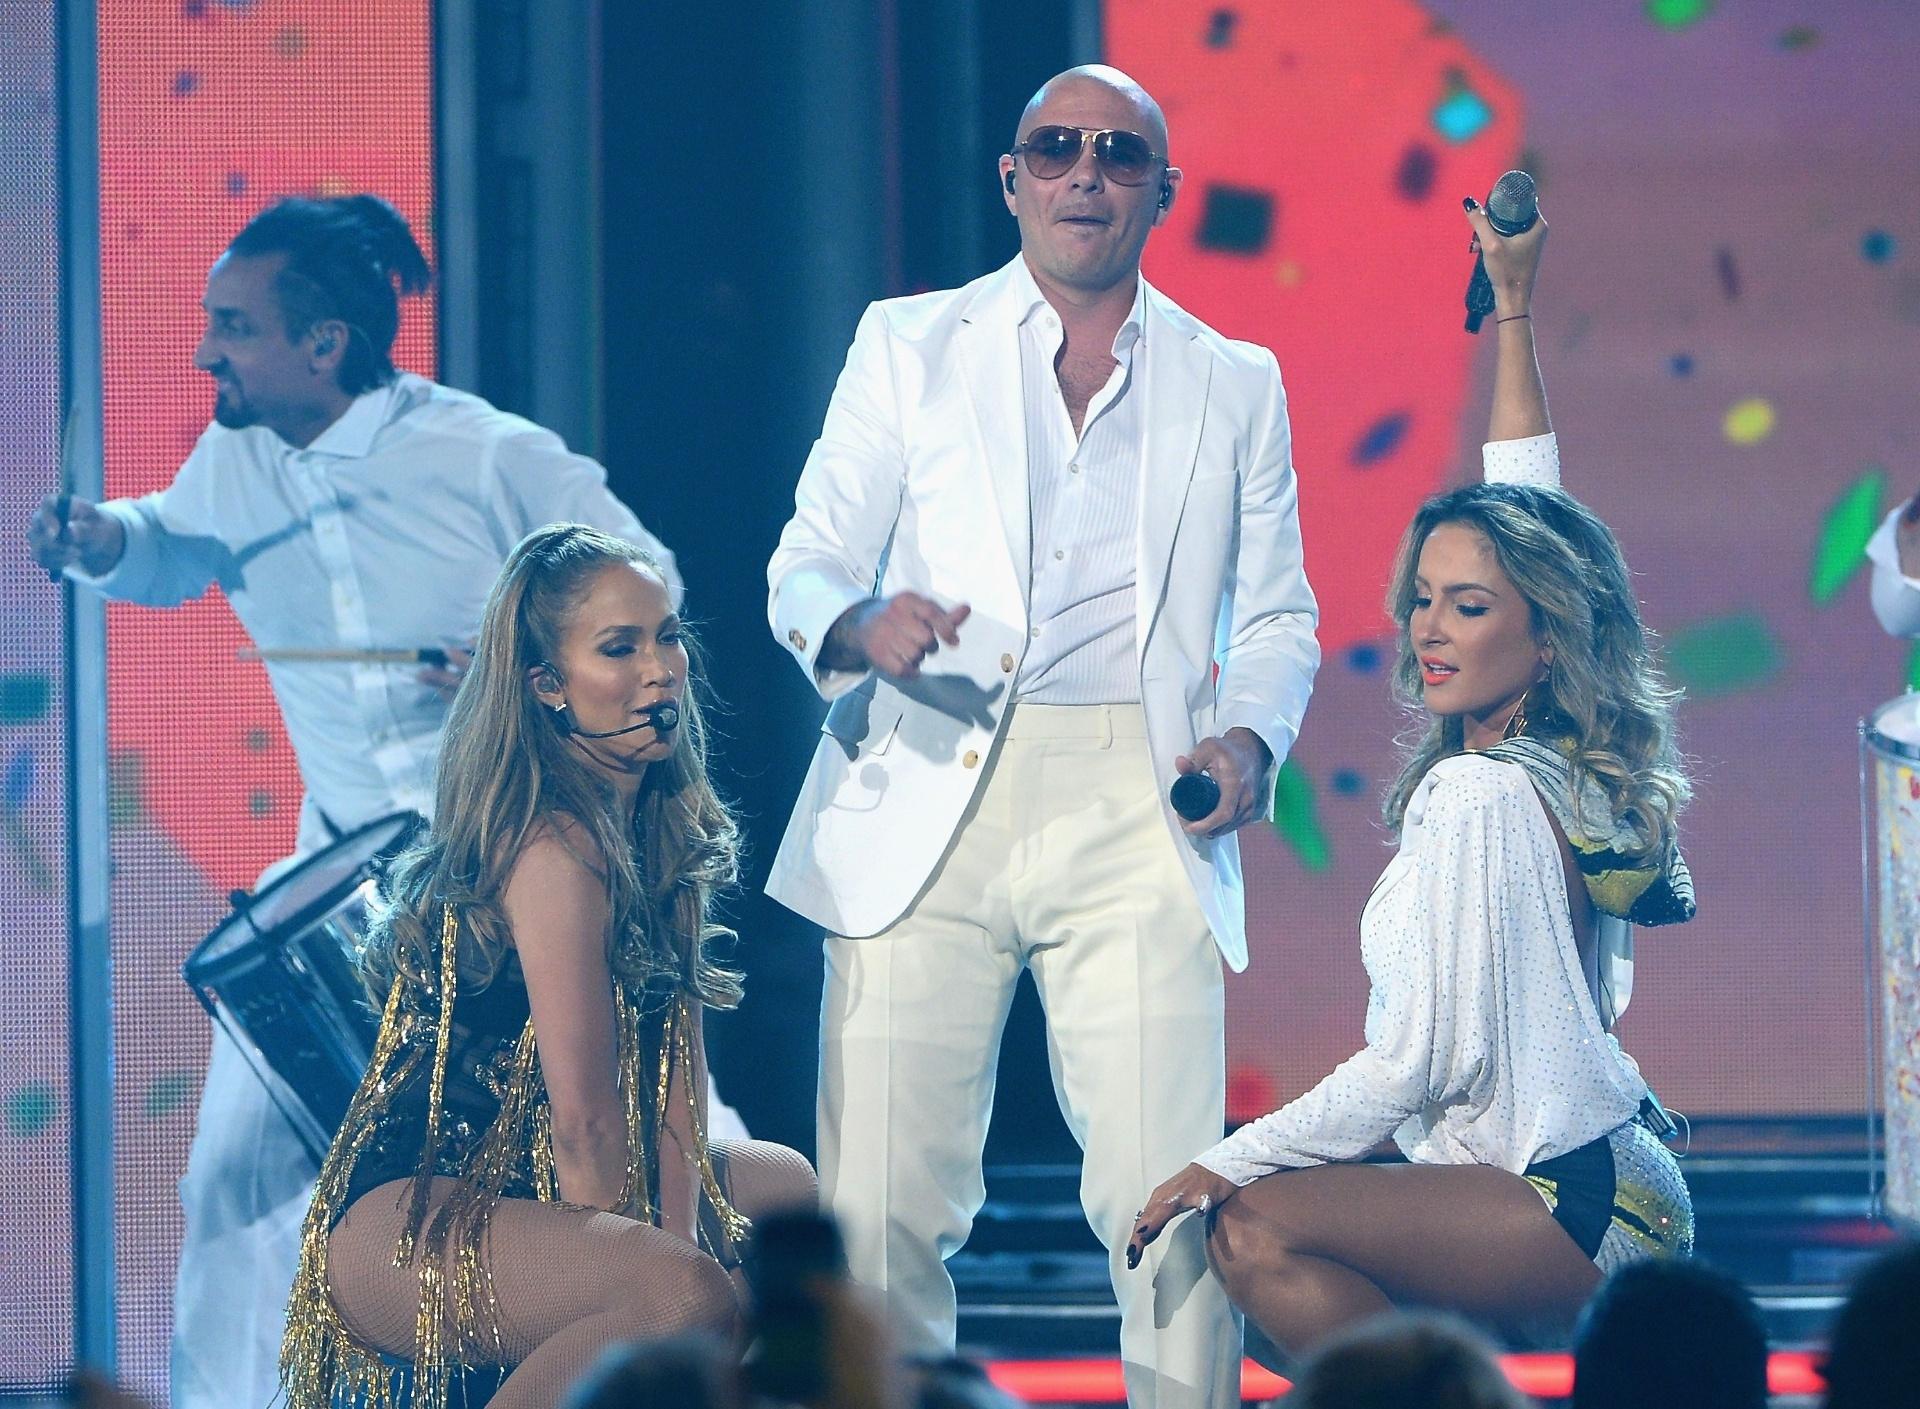 18.mai.2014 - Jennifer Lopez, Pitbull e Claudia Leitte se apresentam no 2014 Billboard Music Awards em Las Vegas. O trio cantou